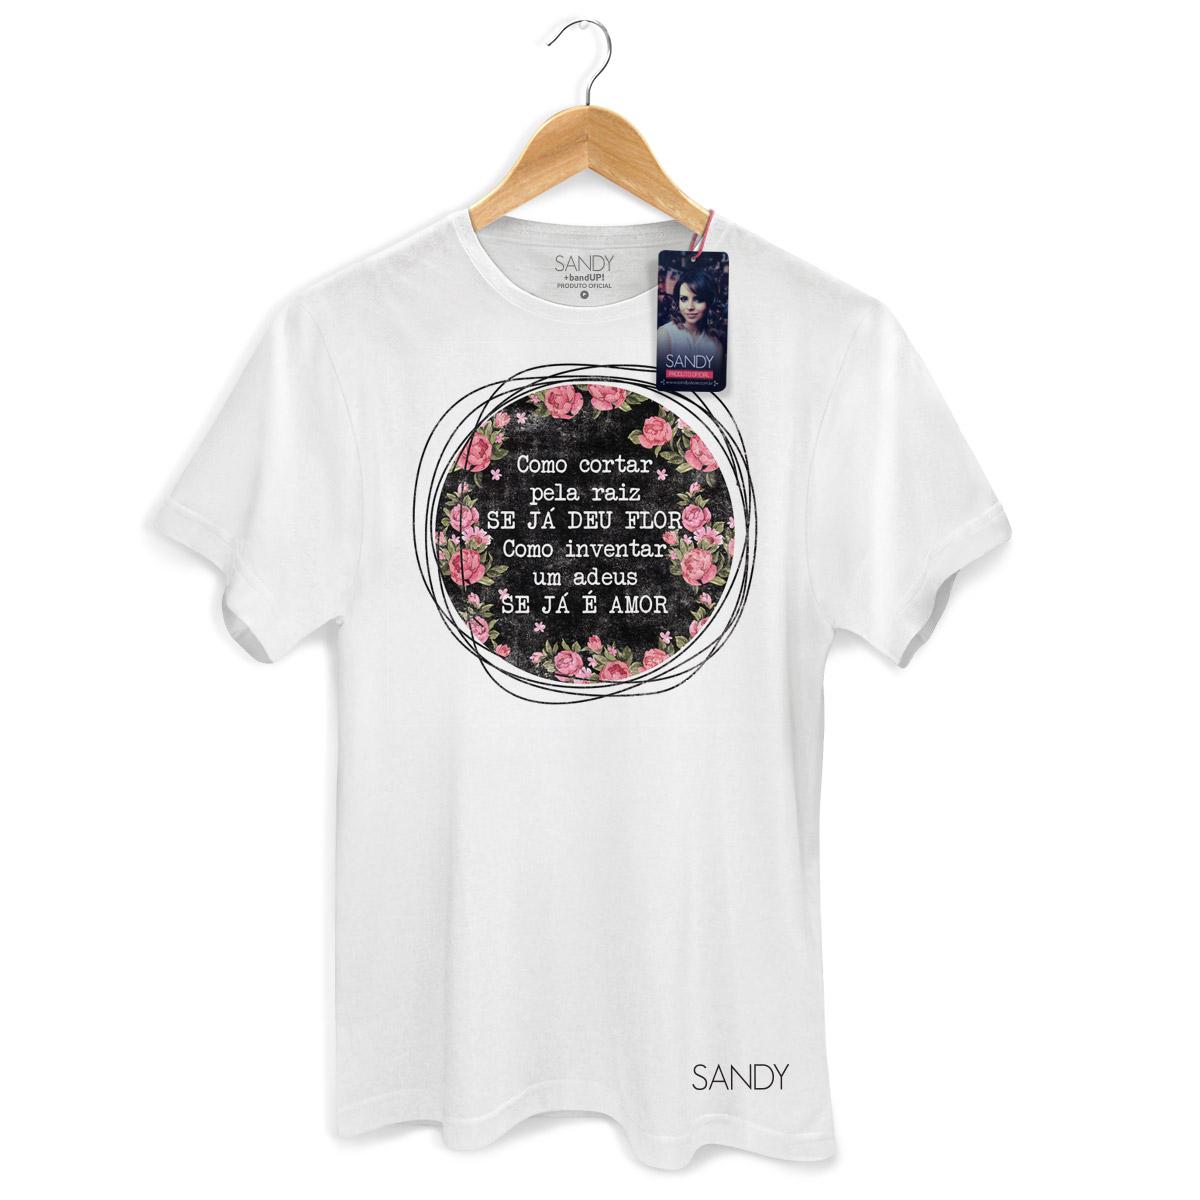 Camiseta Masculina Sandy Como Inventar Um Adeus